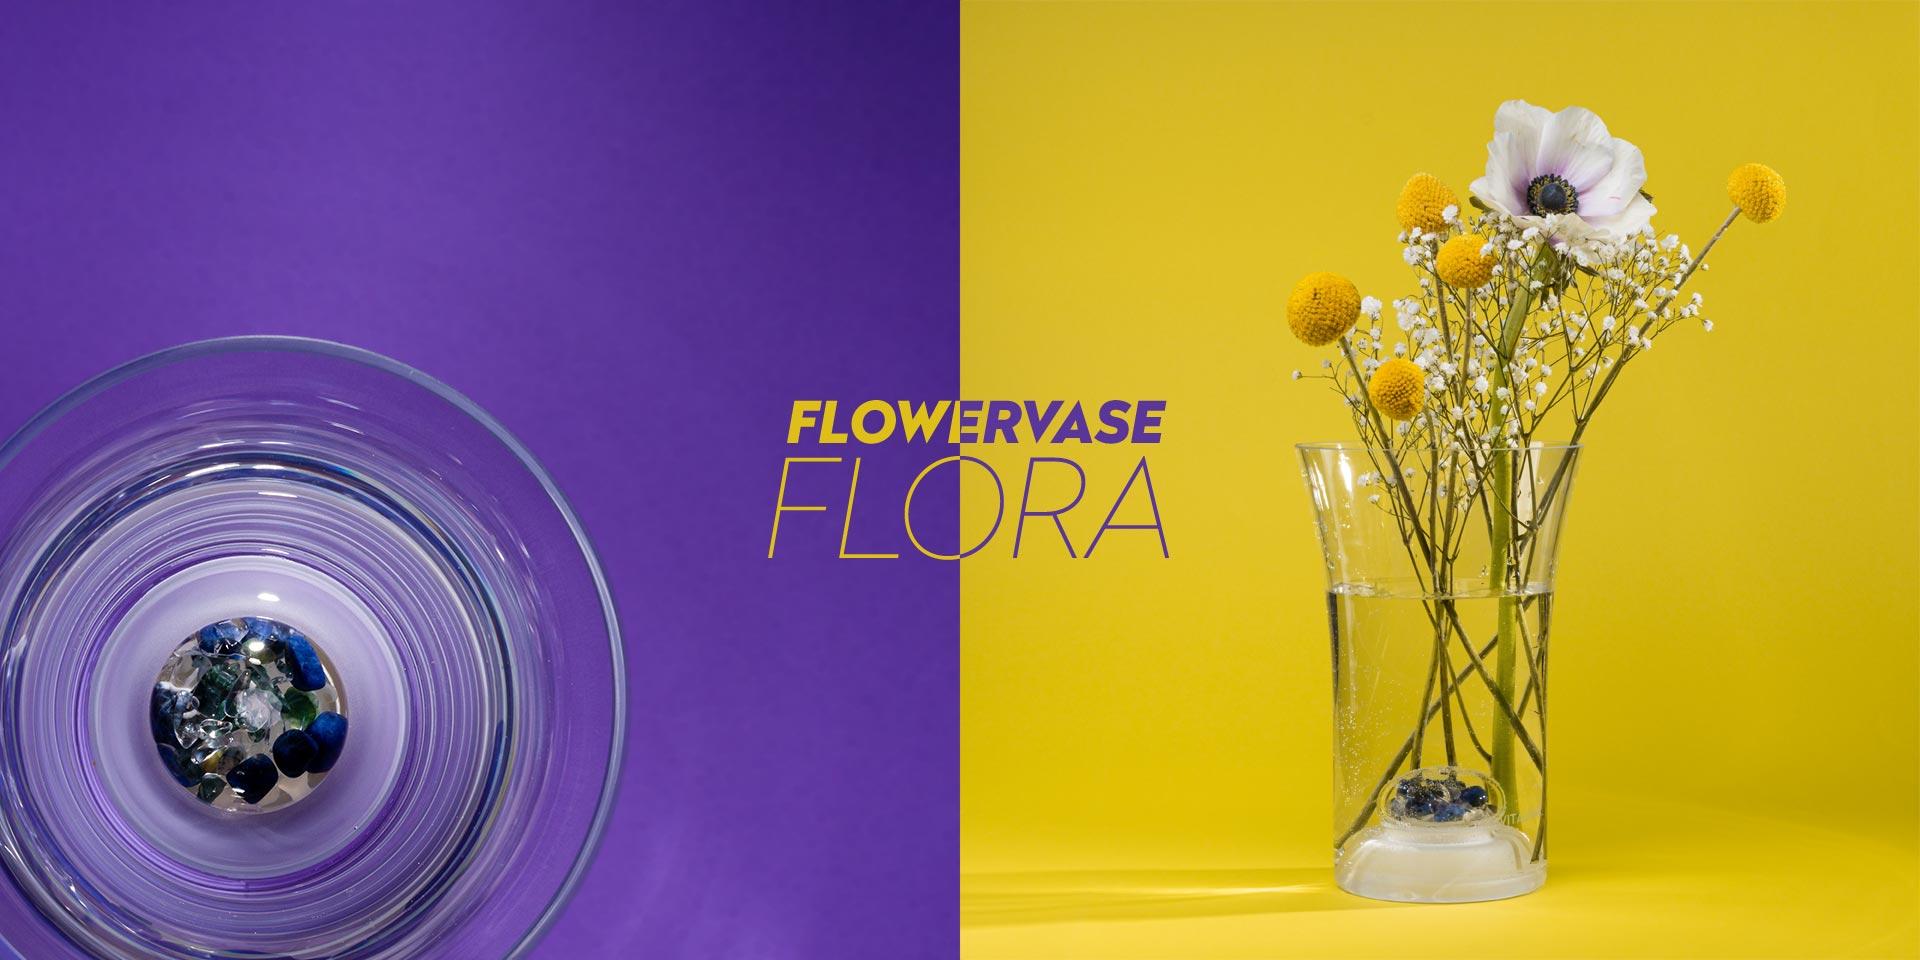 vitajuwel flower vase flora glass crystals gemstones